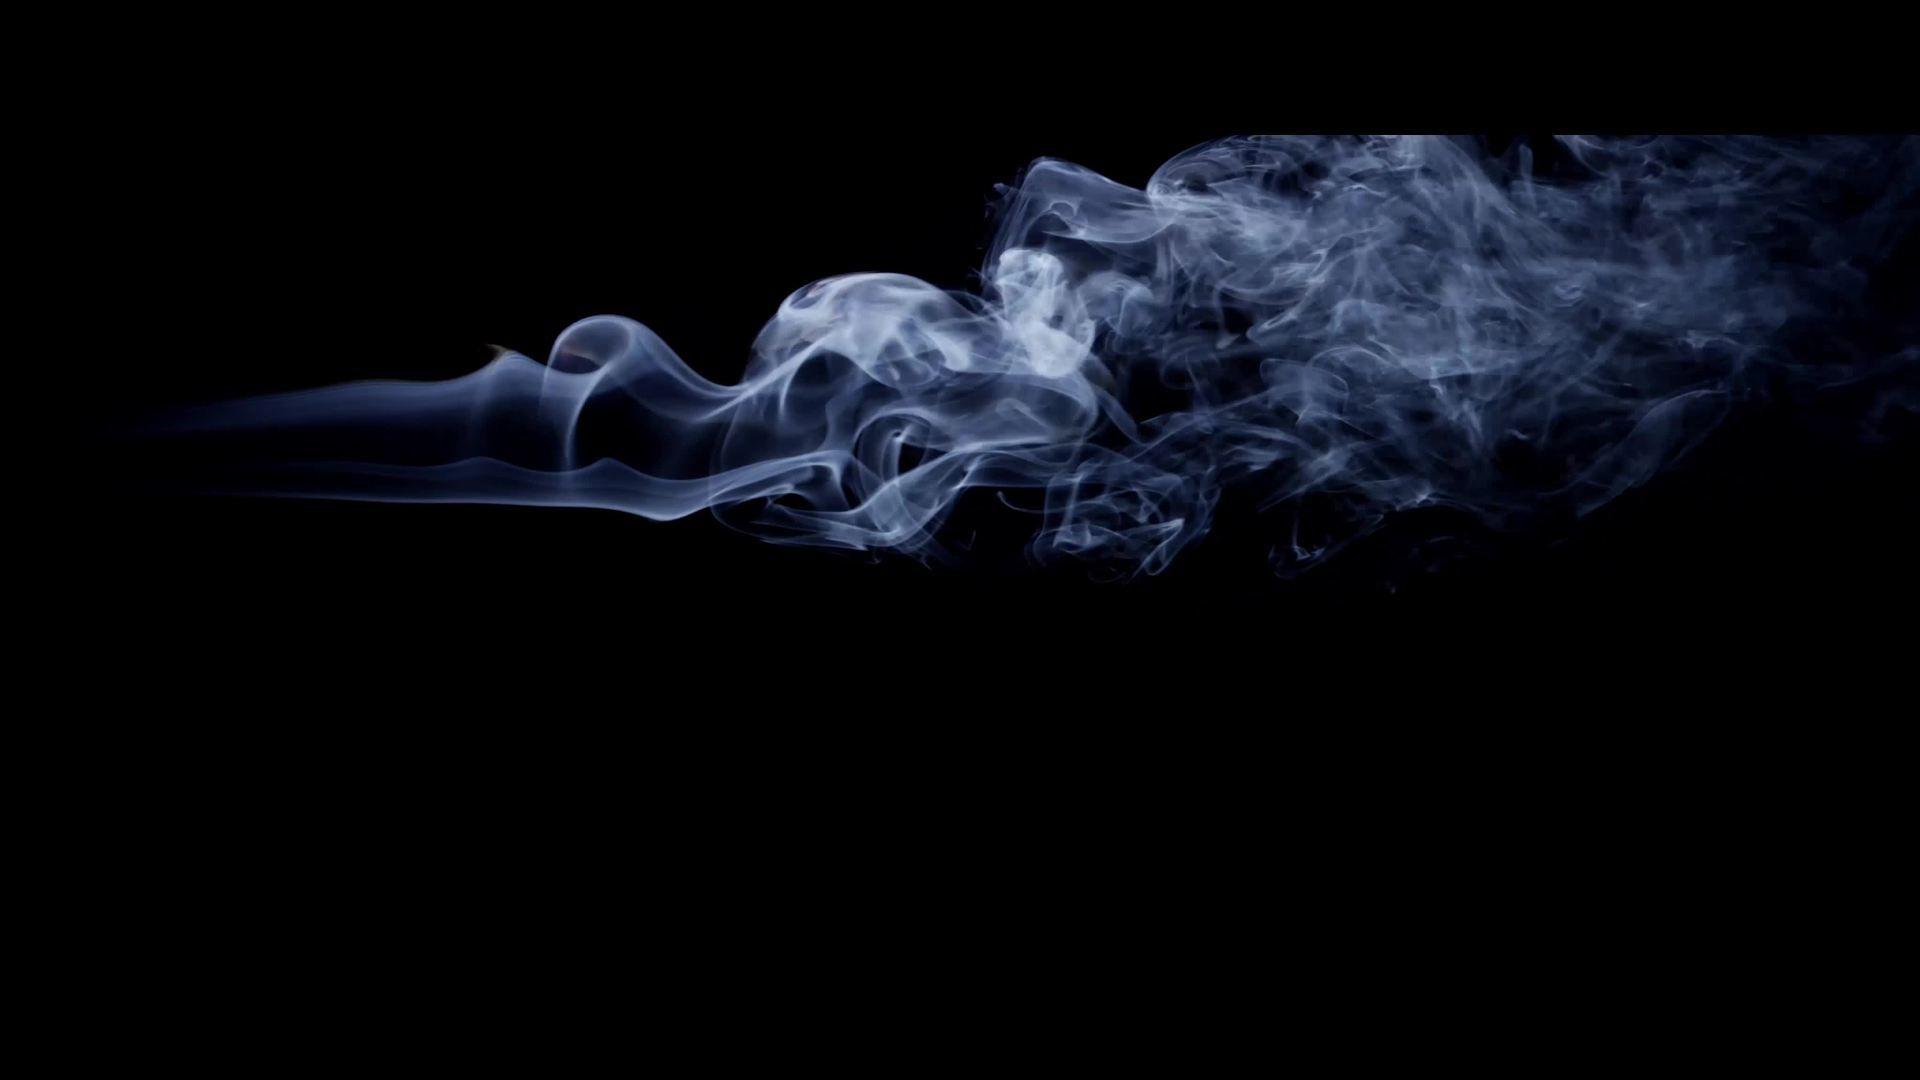 Dark Background With Smoke With Horizontal Path And Beautiful Swirls In K